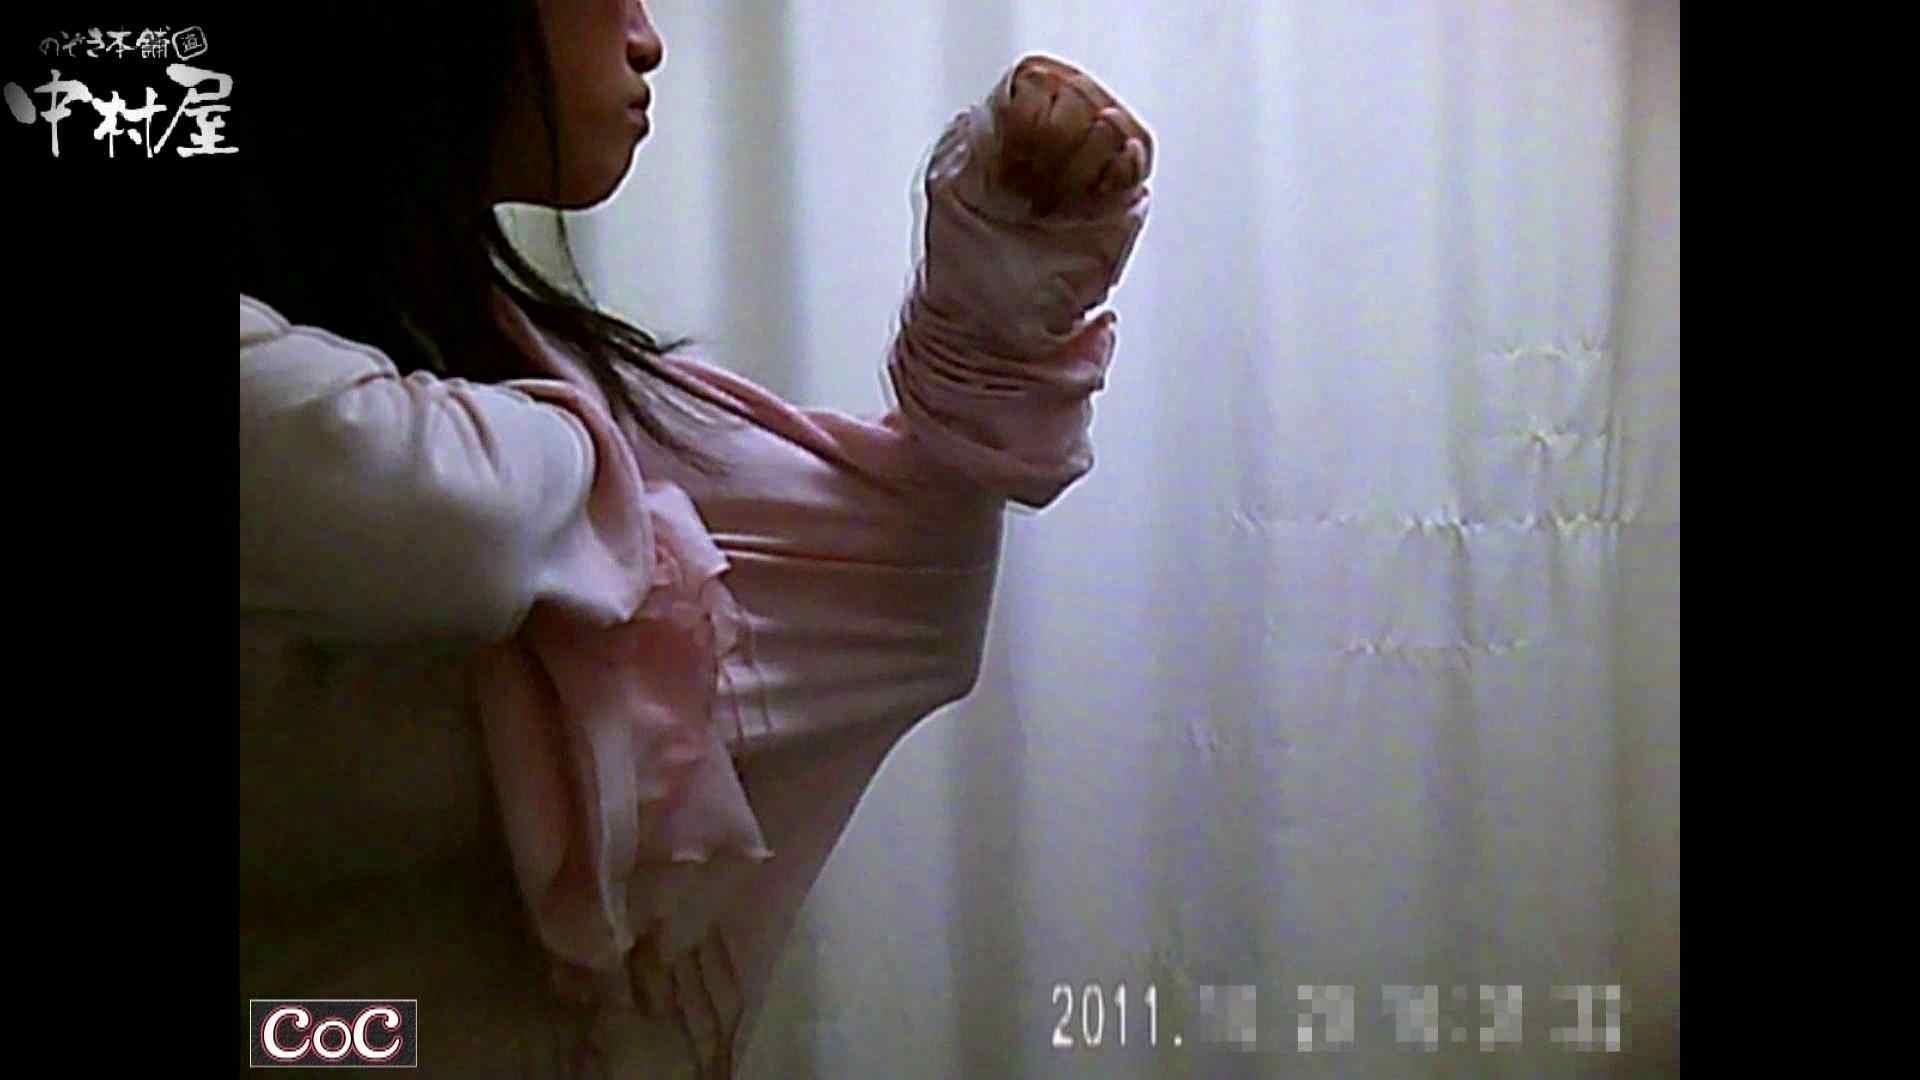 Doctor-X元医者による反抗vol.63 OLハメ撮り  61Pix 36